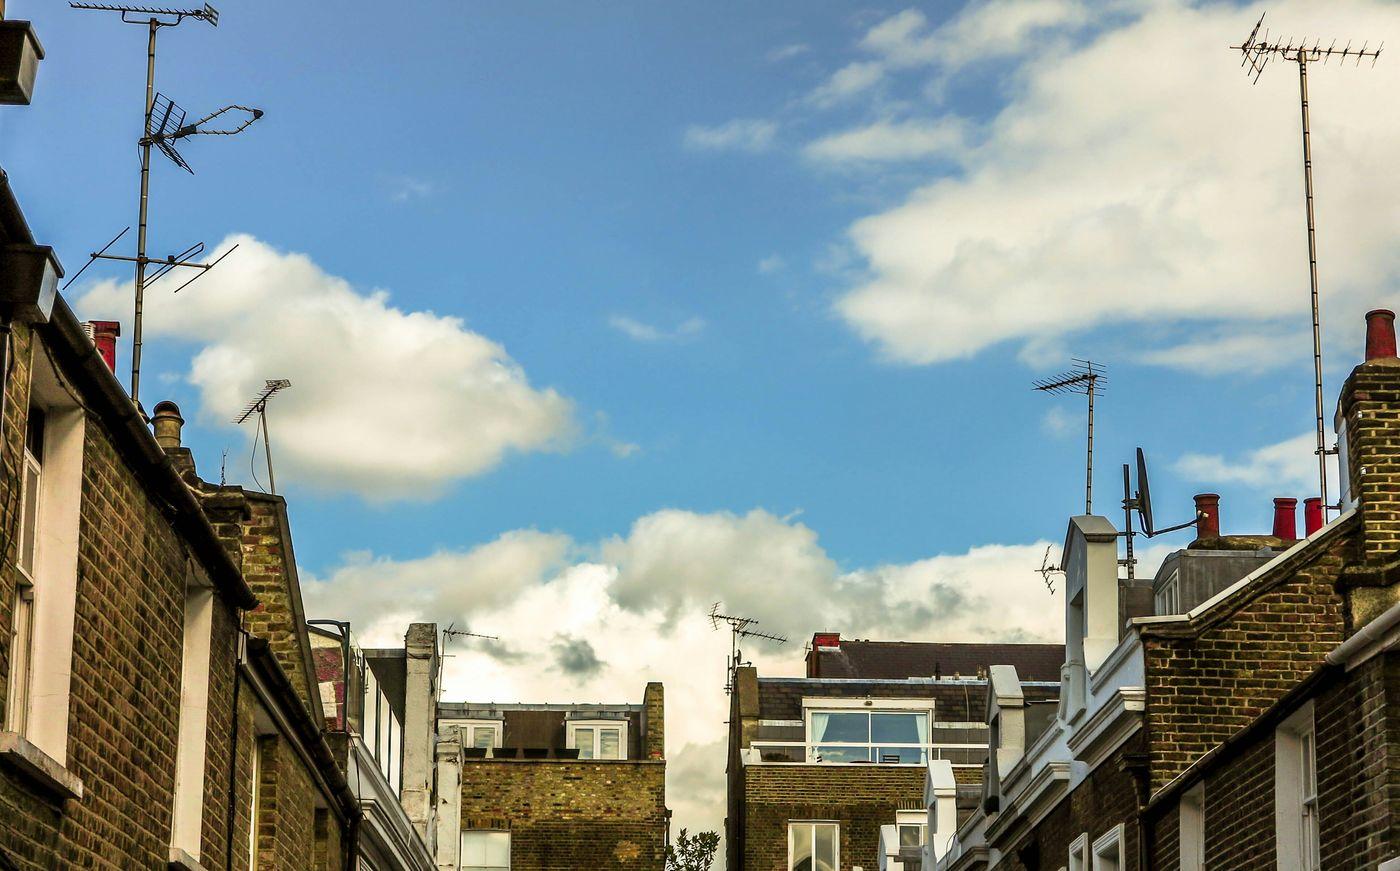 EyeEm Masterclass Popular Sky_collection Portobello Road Portobello Market Nothinghill LONDON❤ Londoncity Londoncalling City Of London